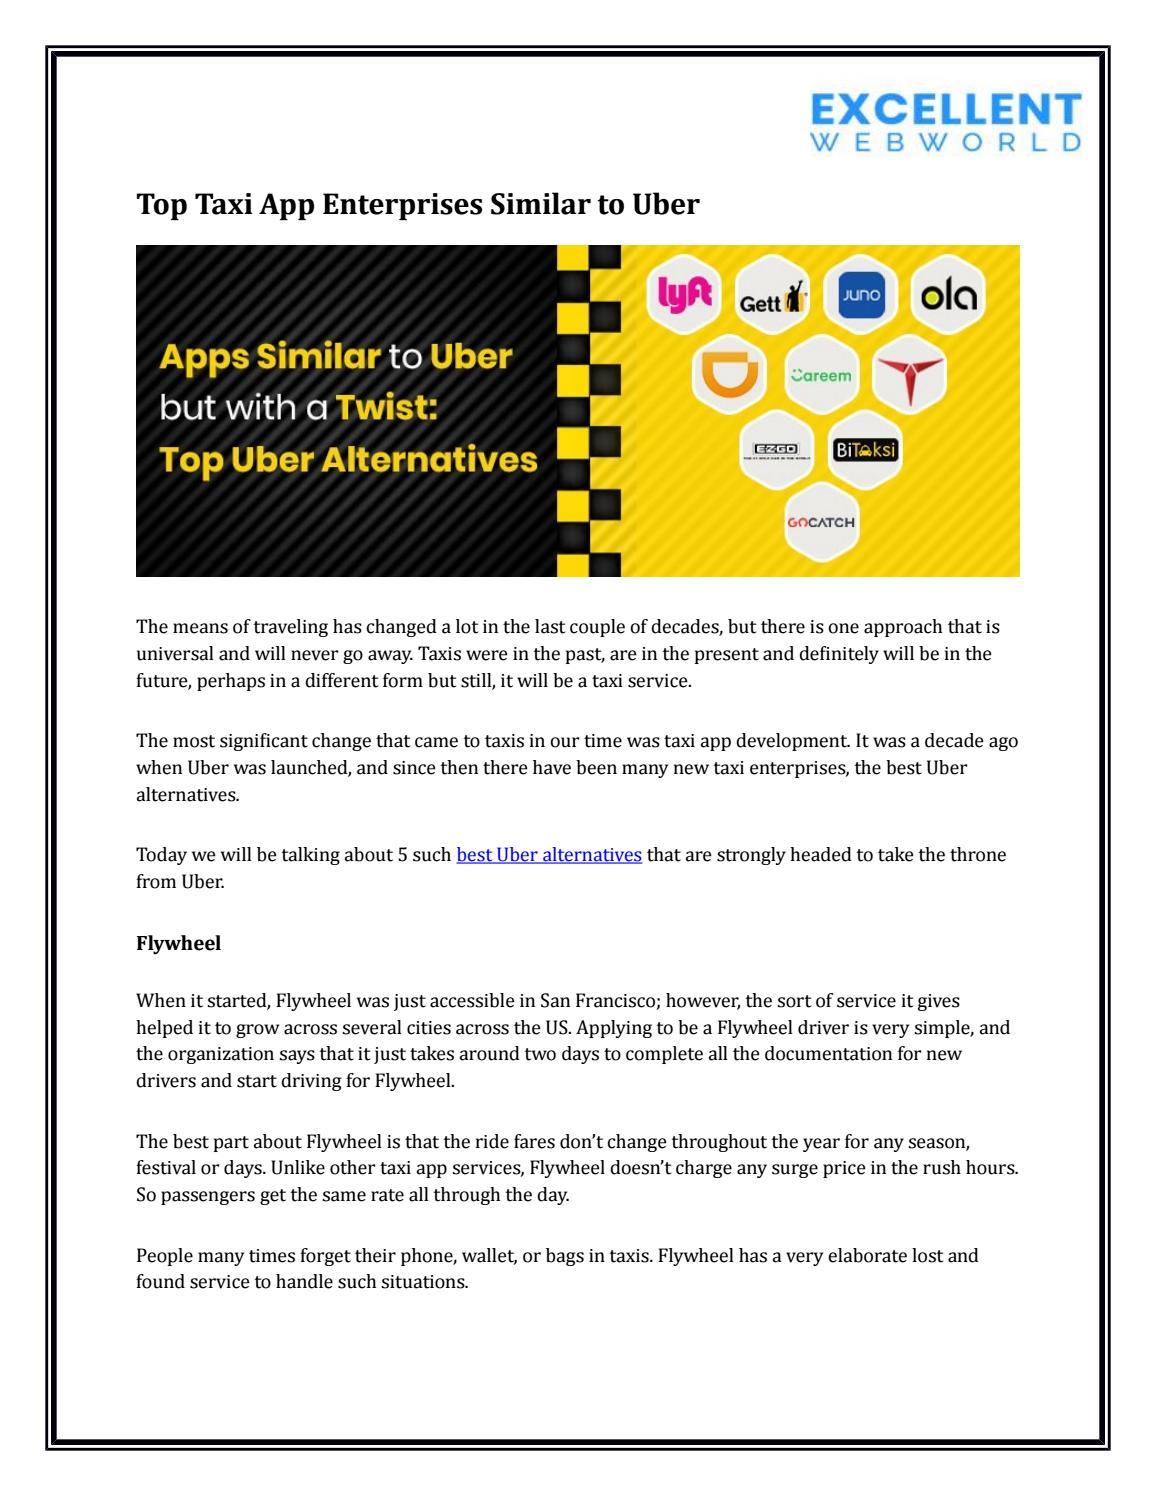 Top Taxi App Enterprises Similar to Uber by Paresh Sagar - issuu